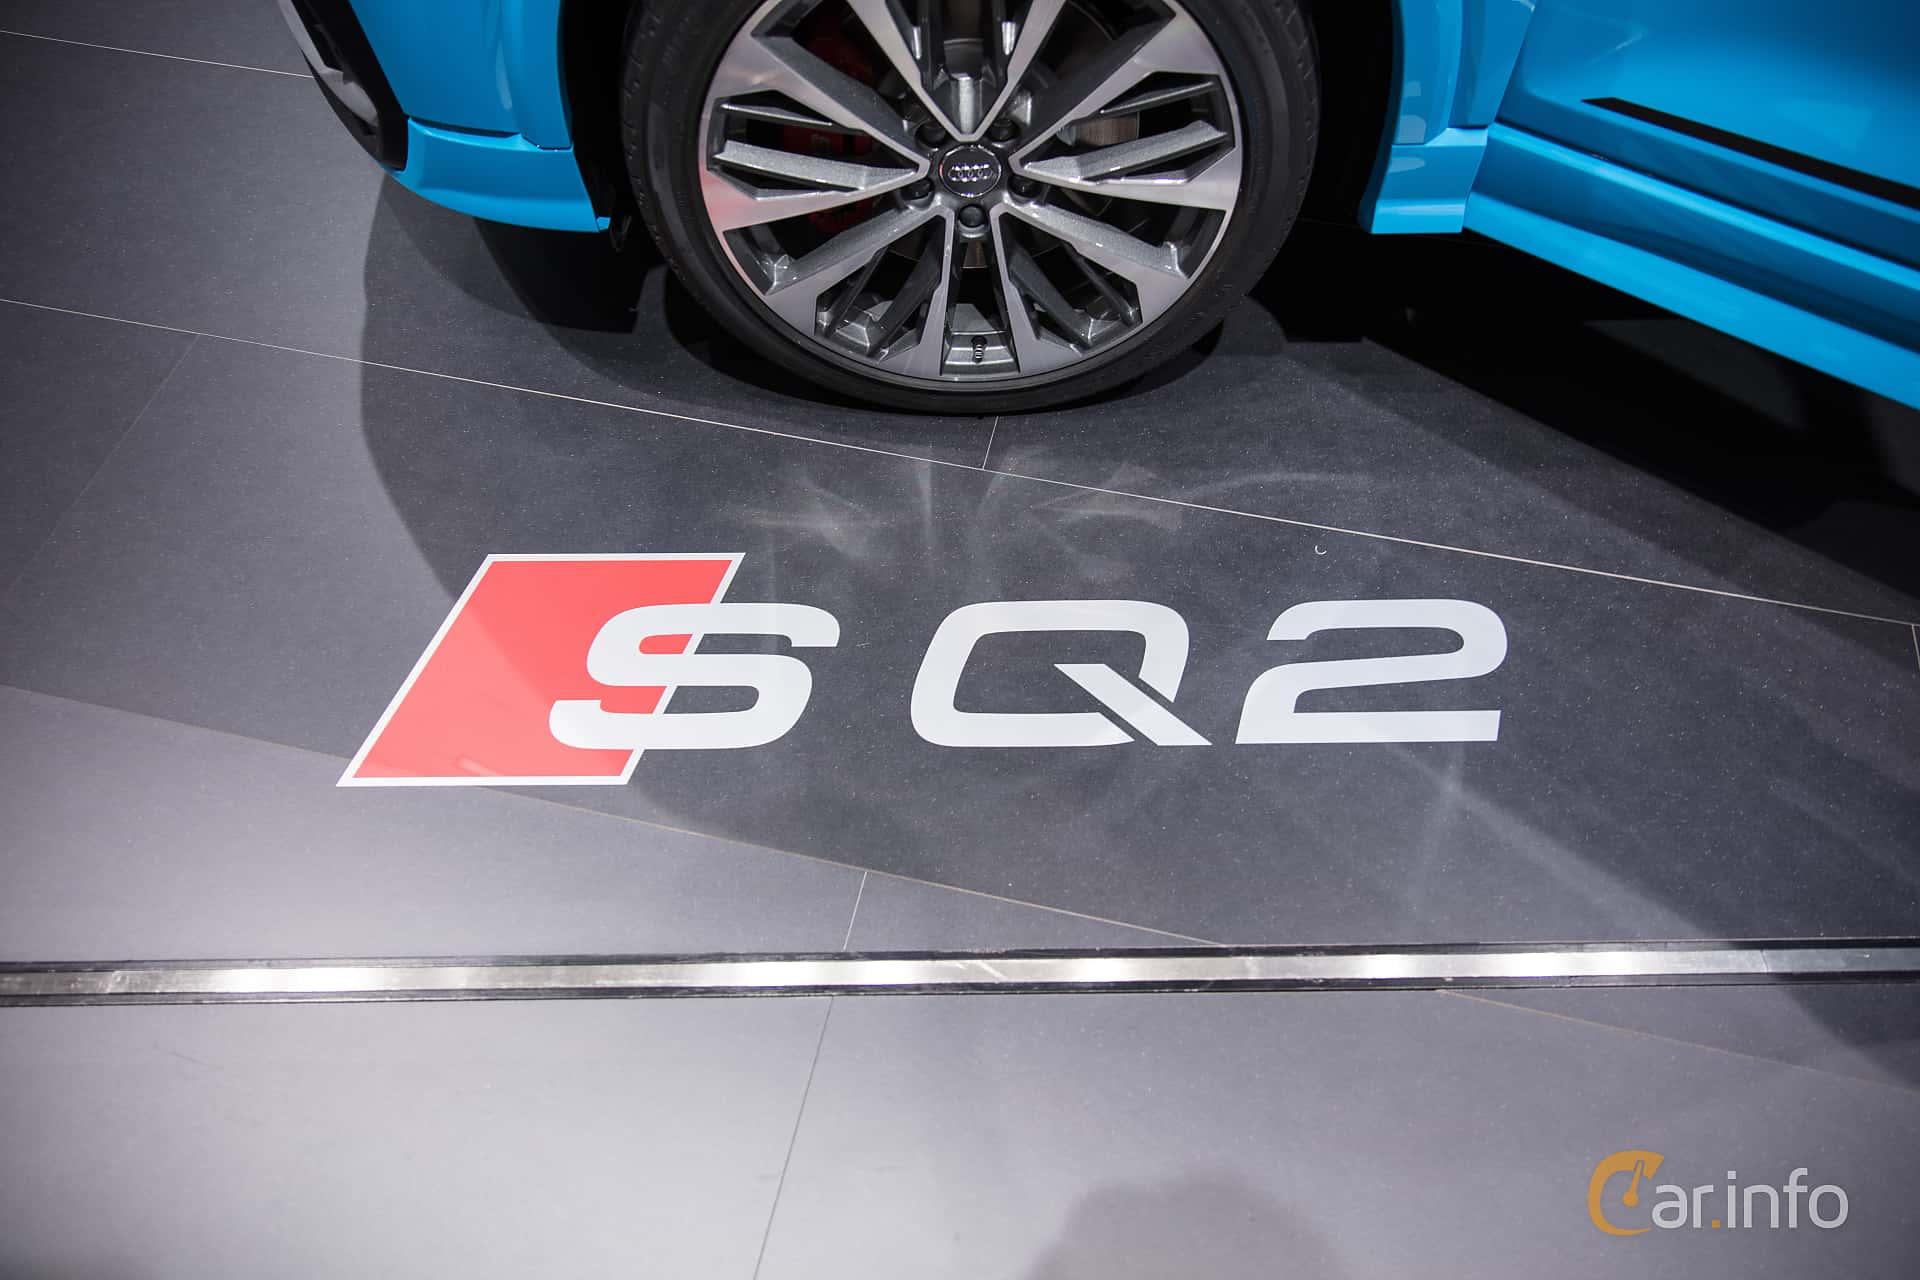 Audi SQ2 2.0 TFSI quattro S Tronic, 300hp, 2019 at Paris Motor Show 2018